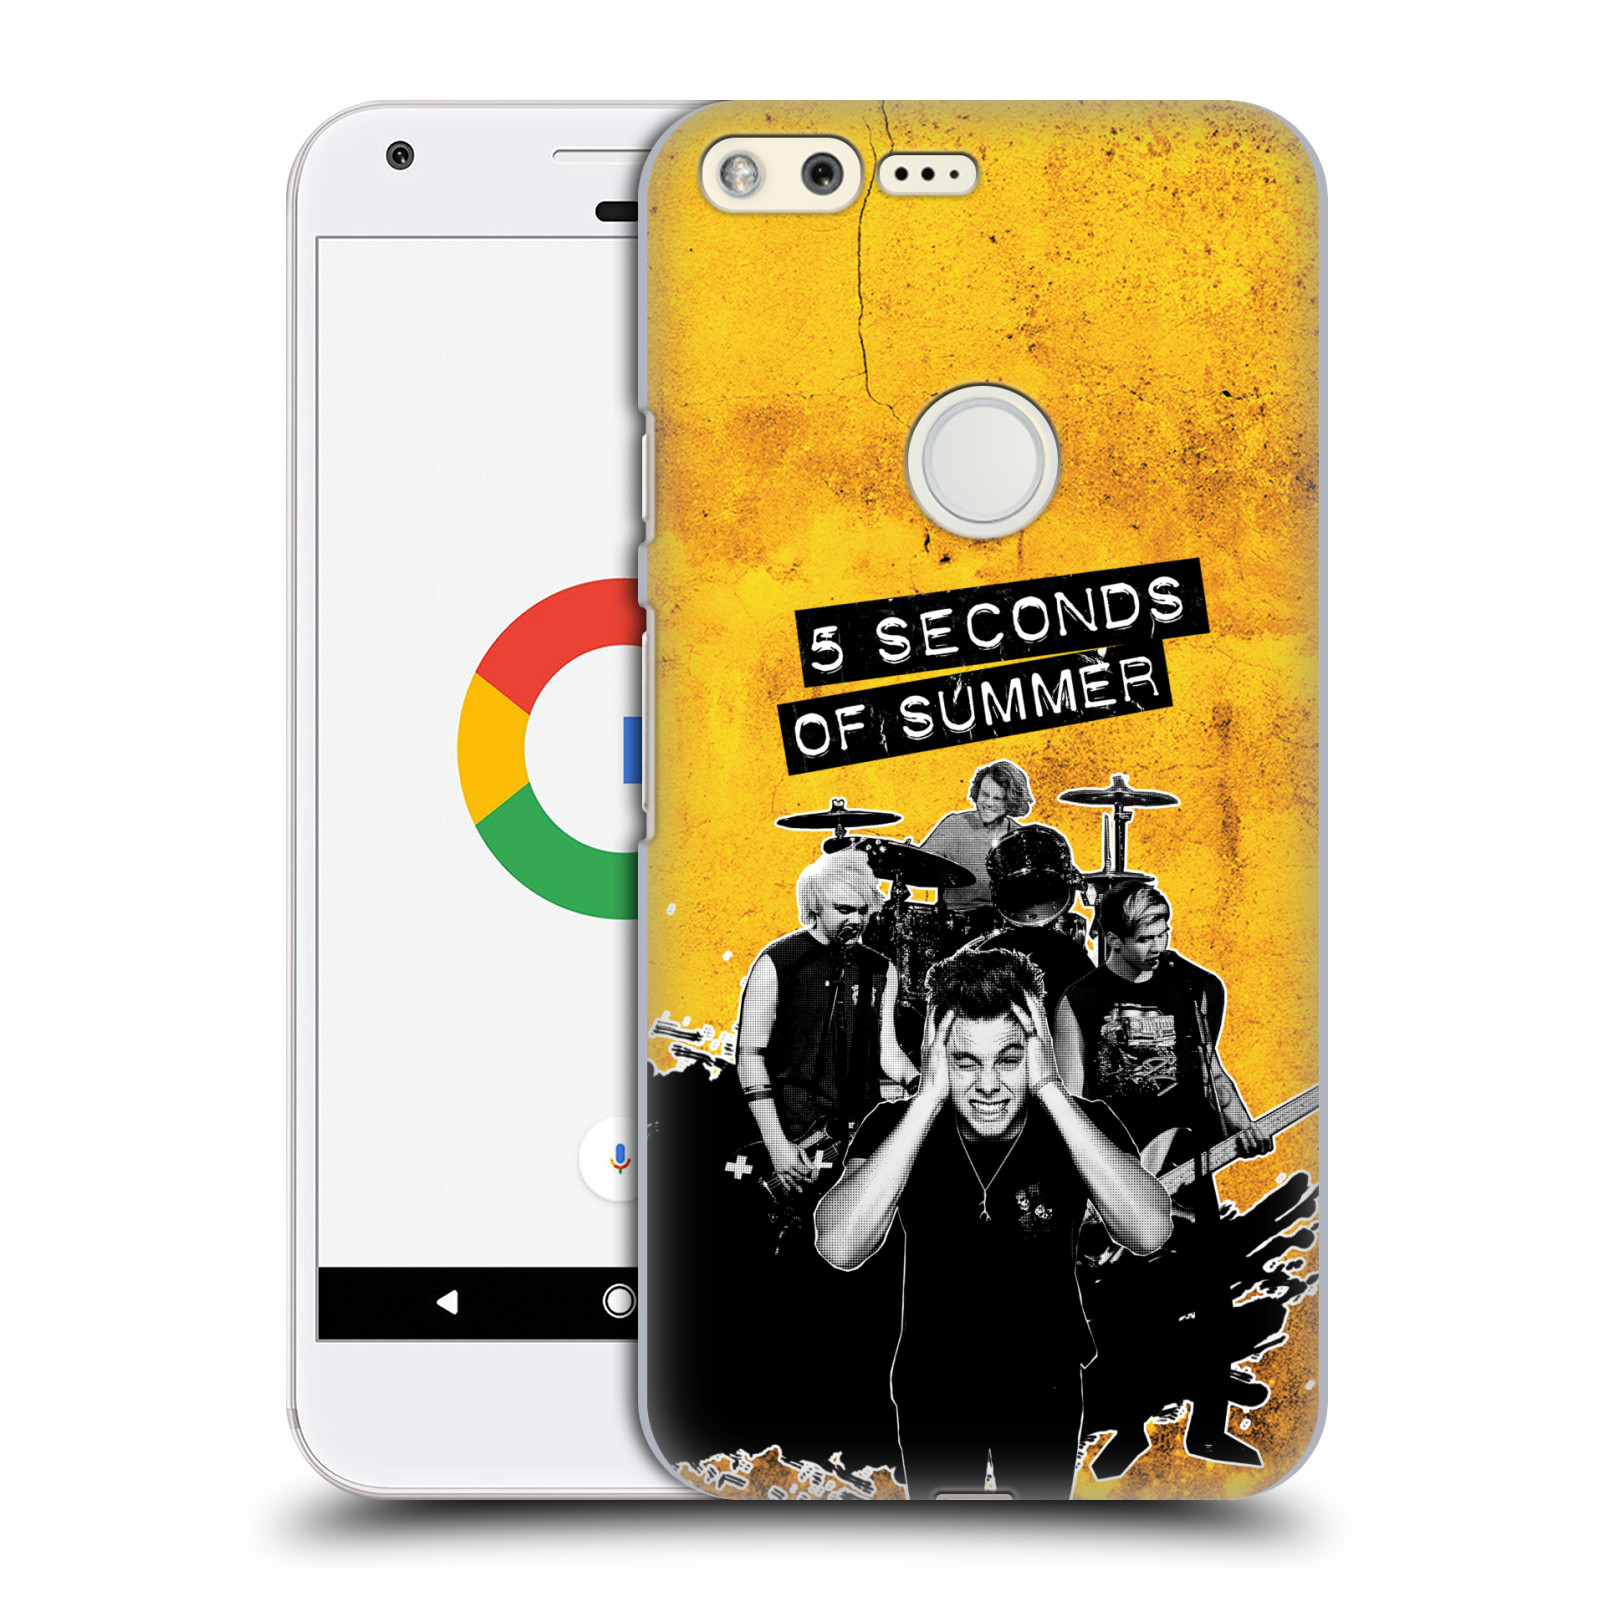 Plastové pouzdro na mobil Google Pixel HEAD CASE 5 Seconds of Summer - Band Yellow